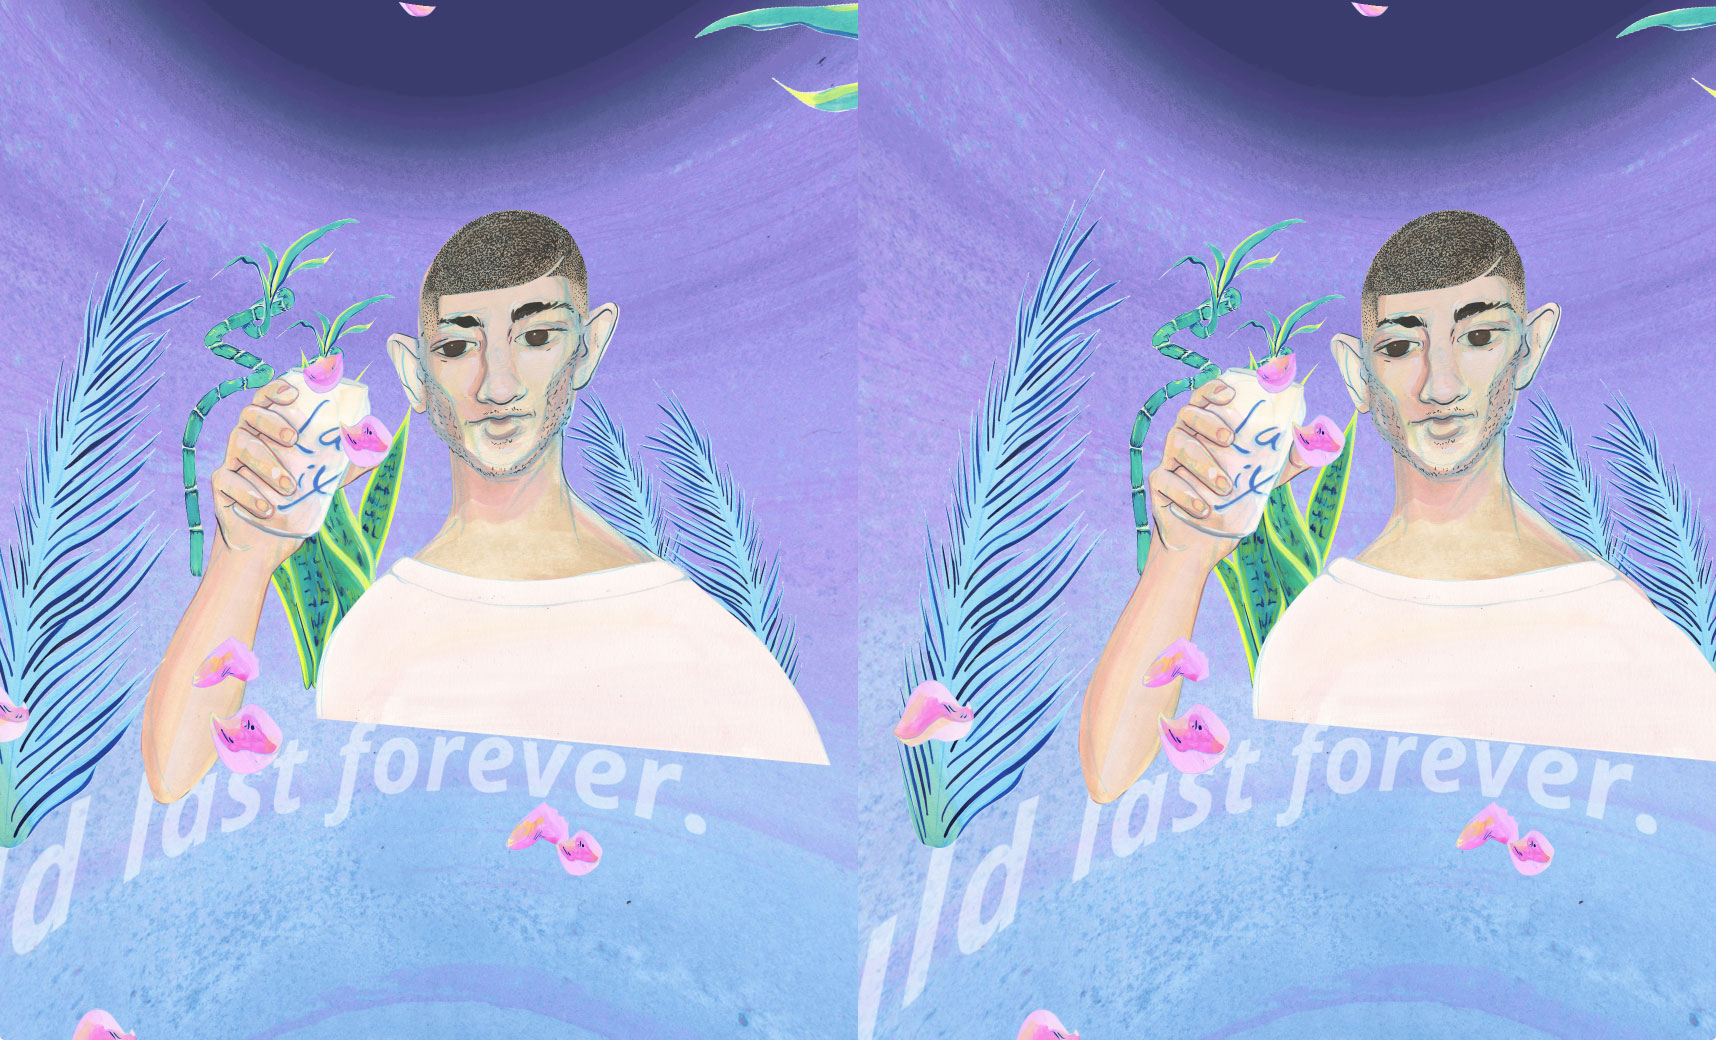 Martha Hipley, Ur Cardboard Pet, 2016 (2D still from the VR experience)